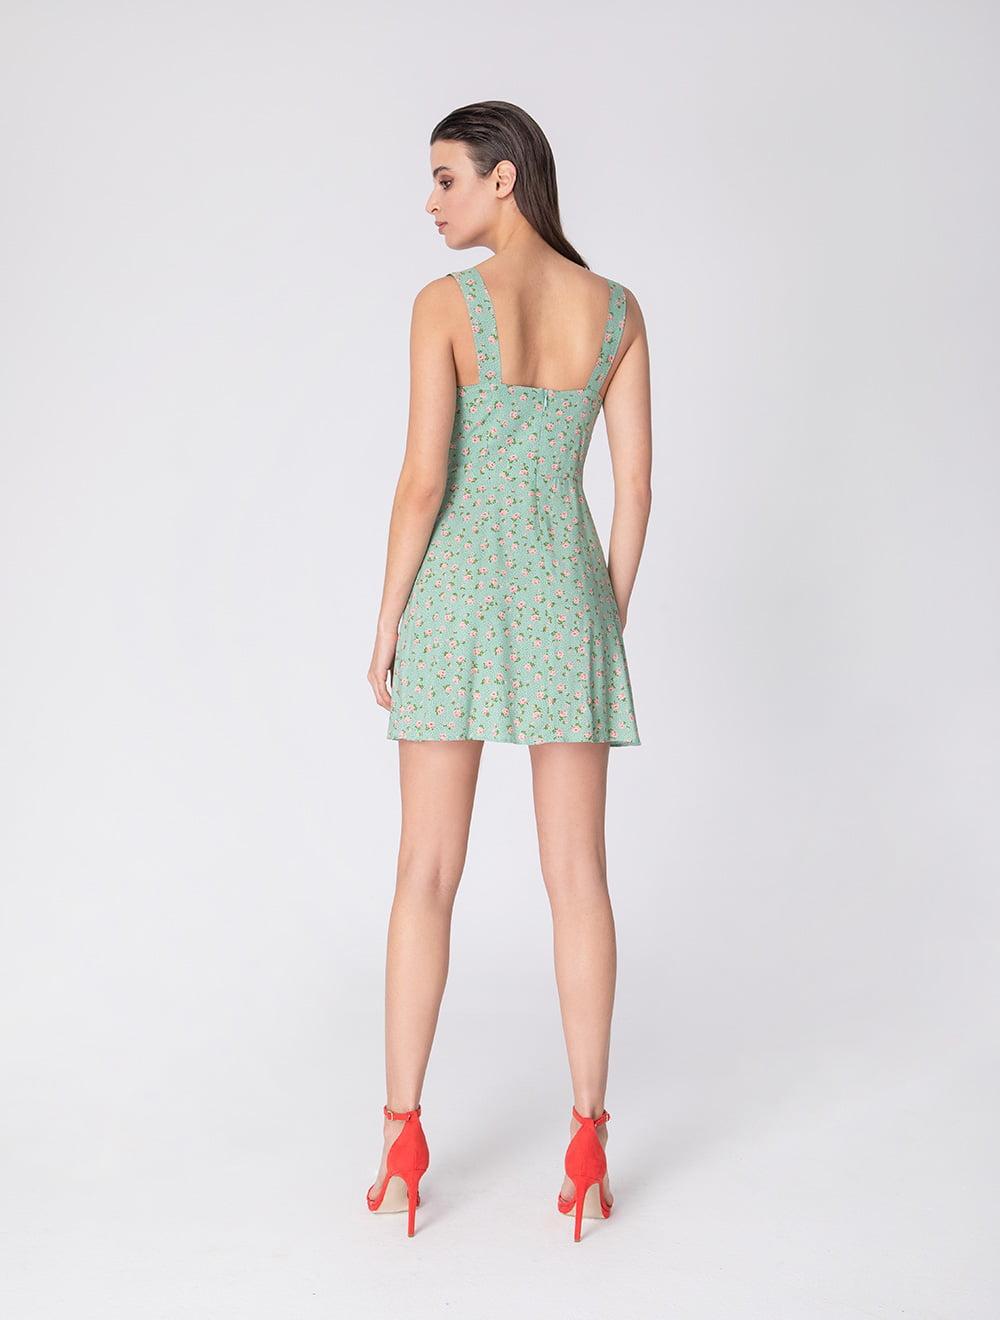 Irene dress